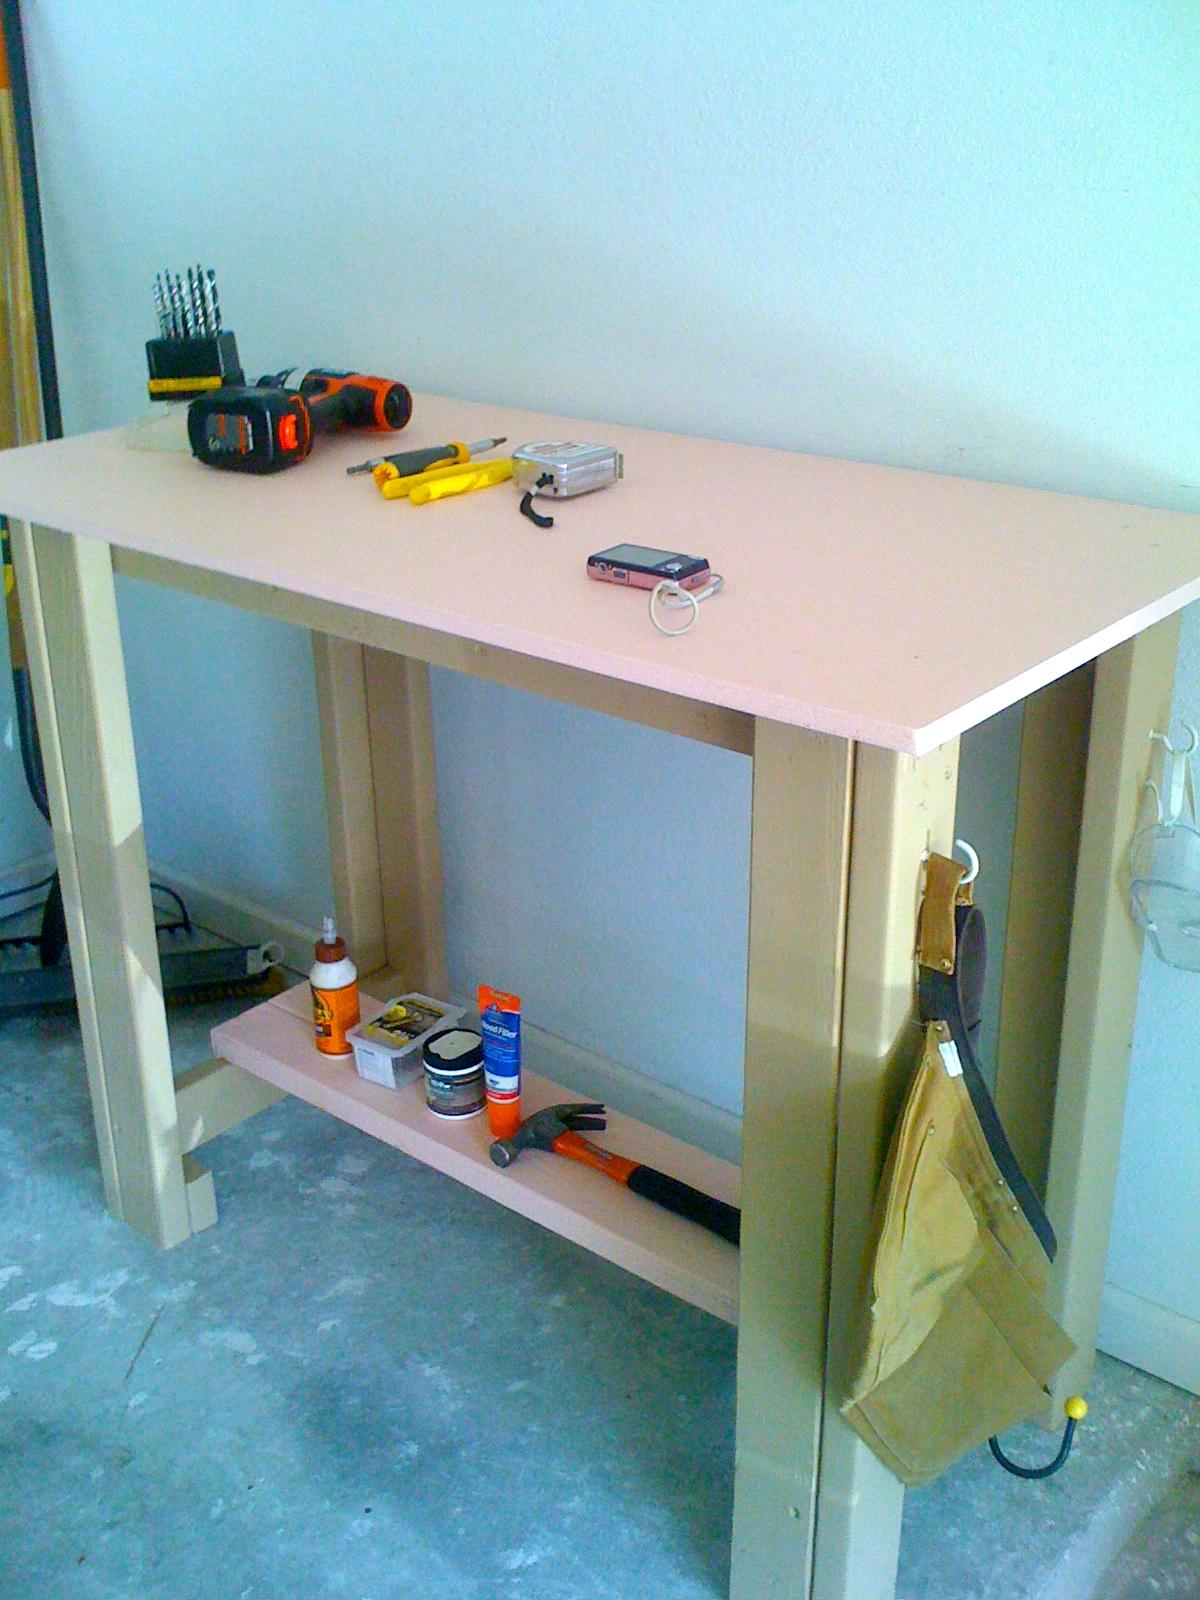 Secret agent man building the sturdy work bench